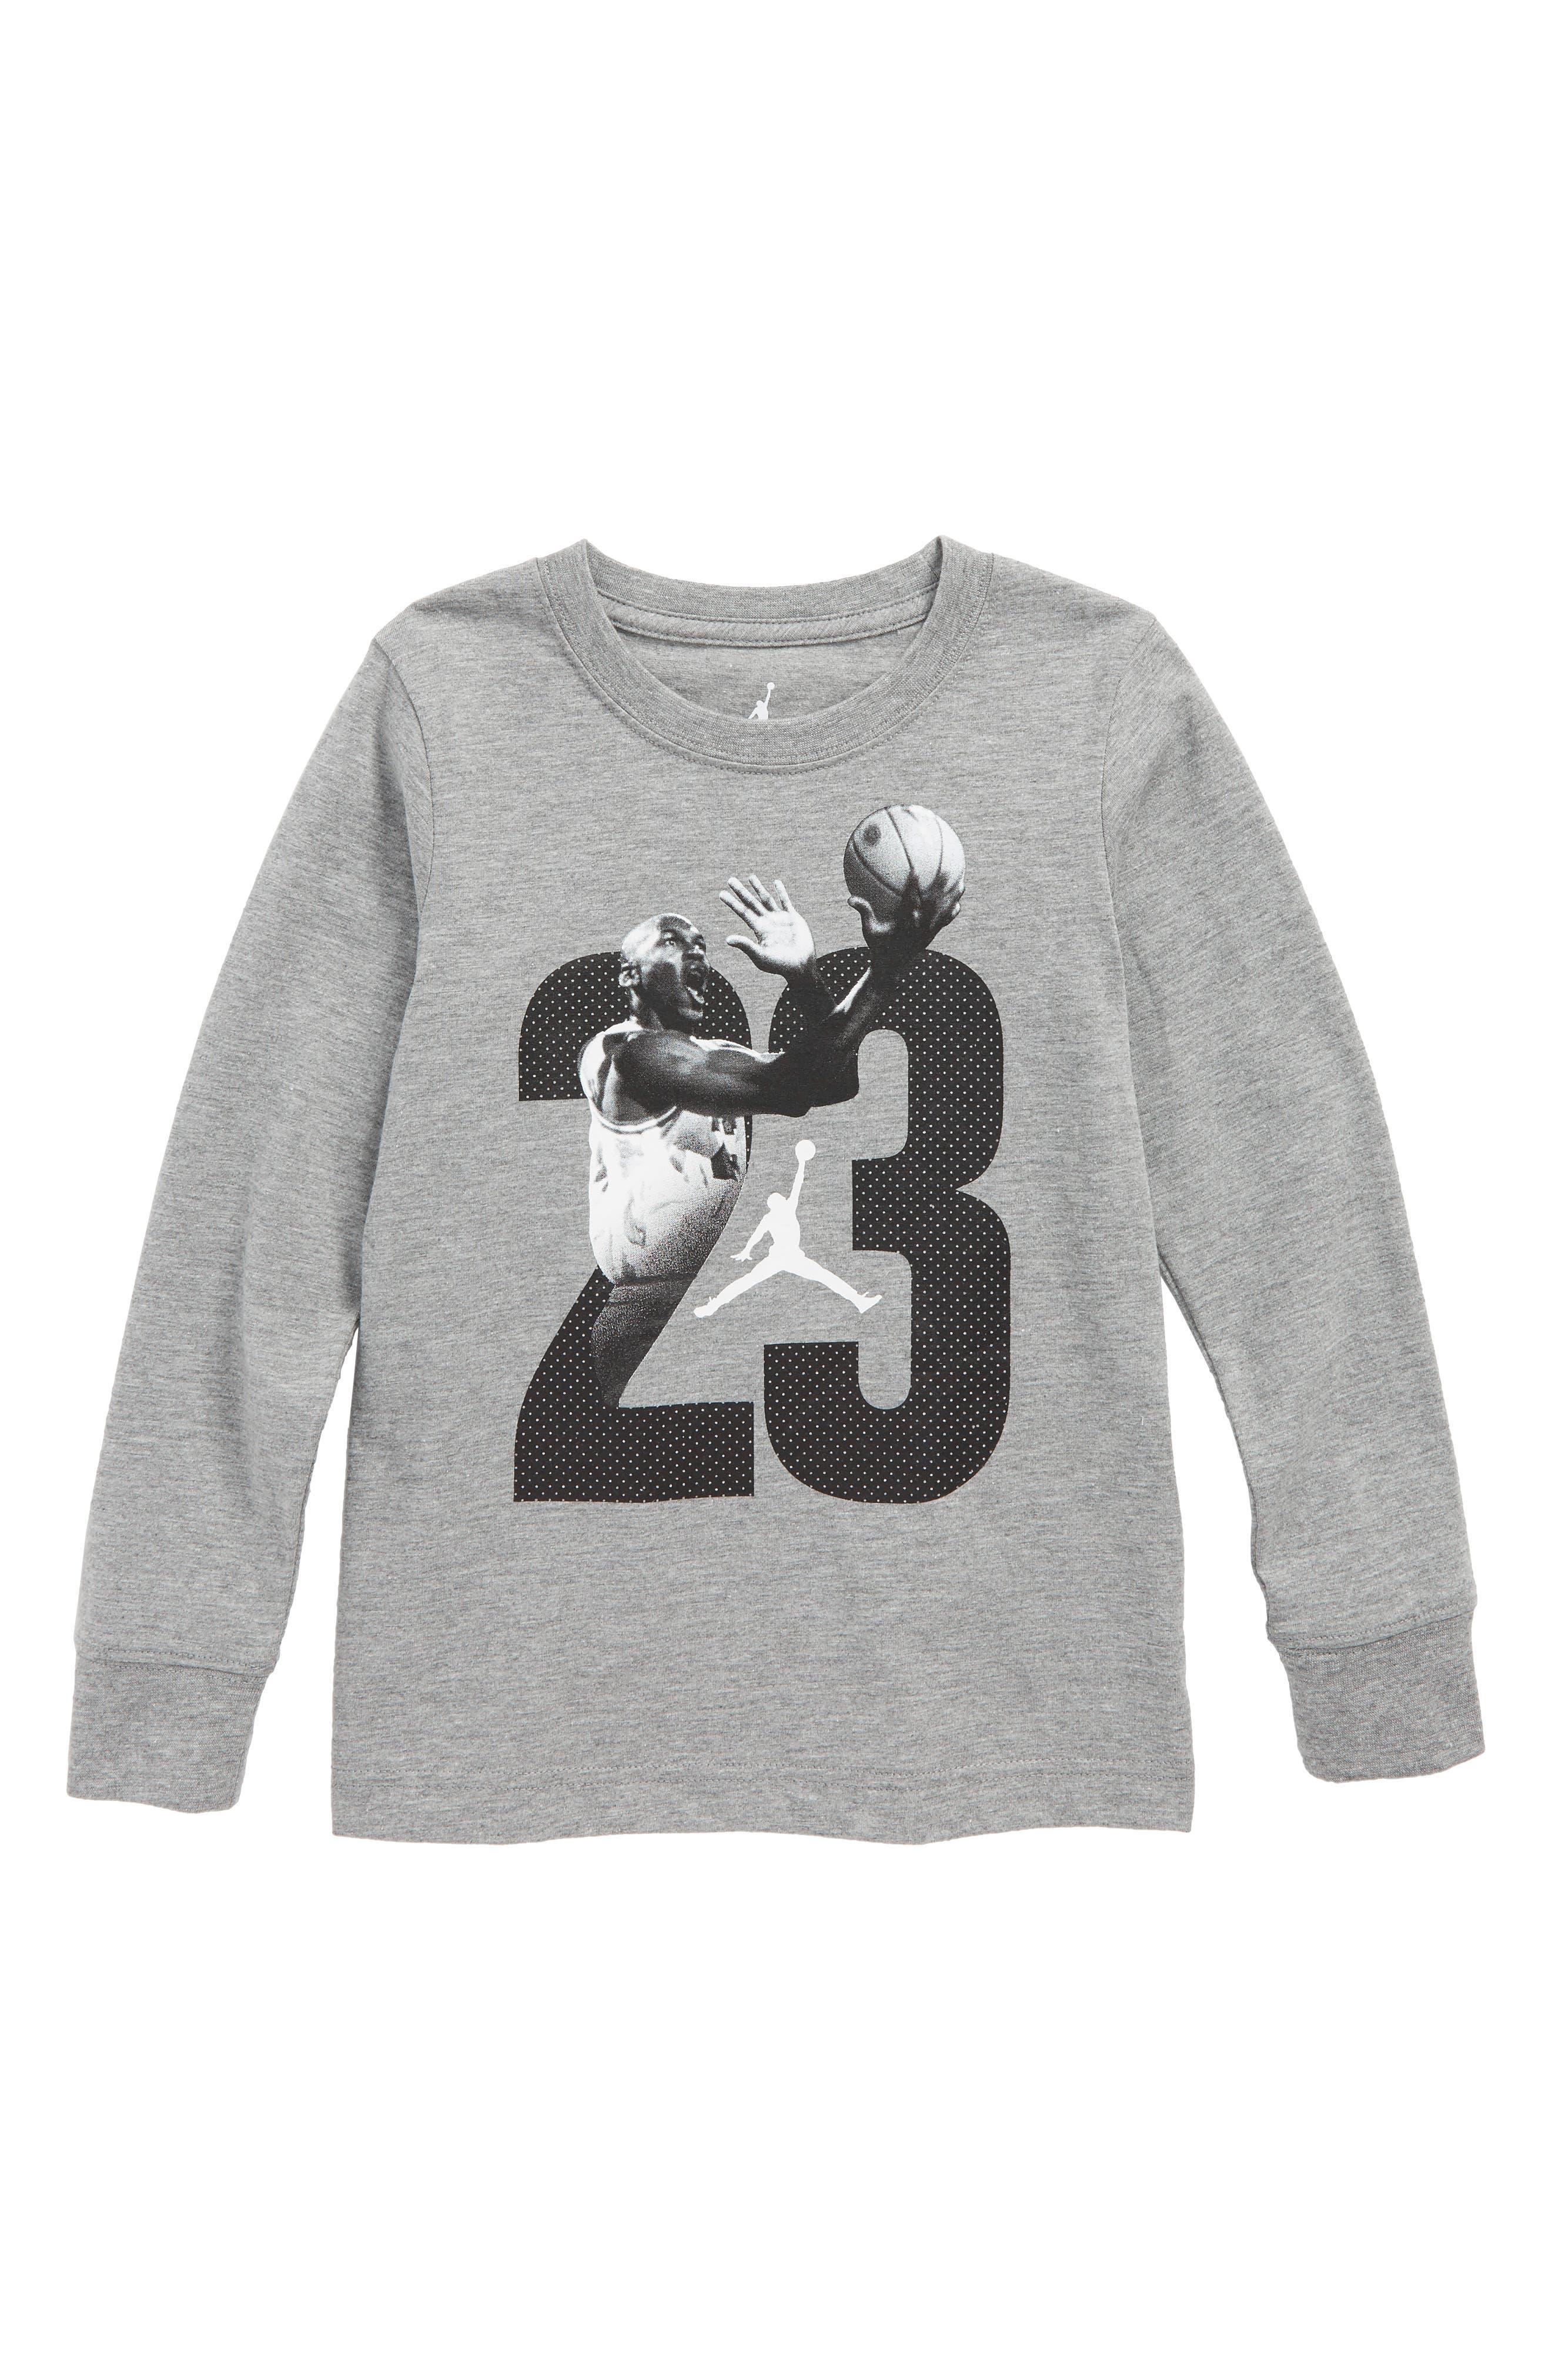 Jordan 23 Graphic Long Sleeve T-Shirt,                         Main,                         color, Carbon Heather